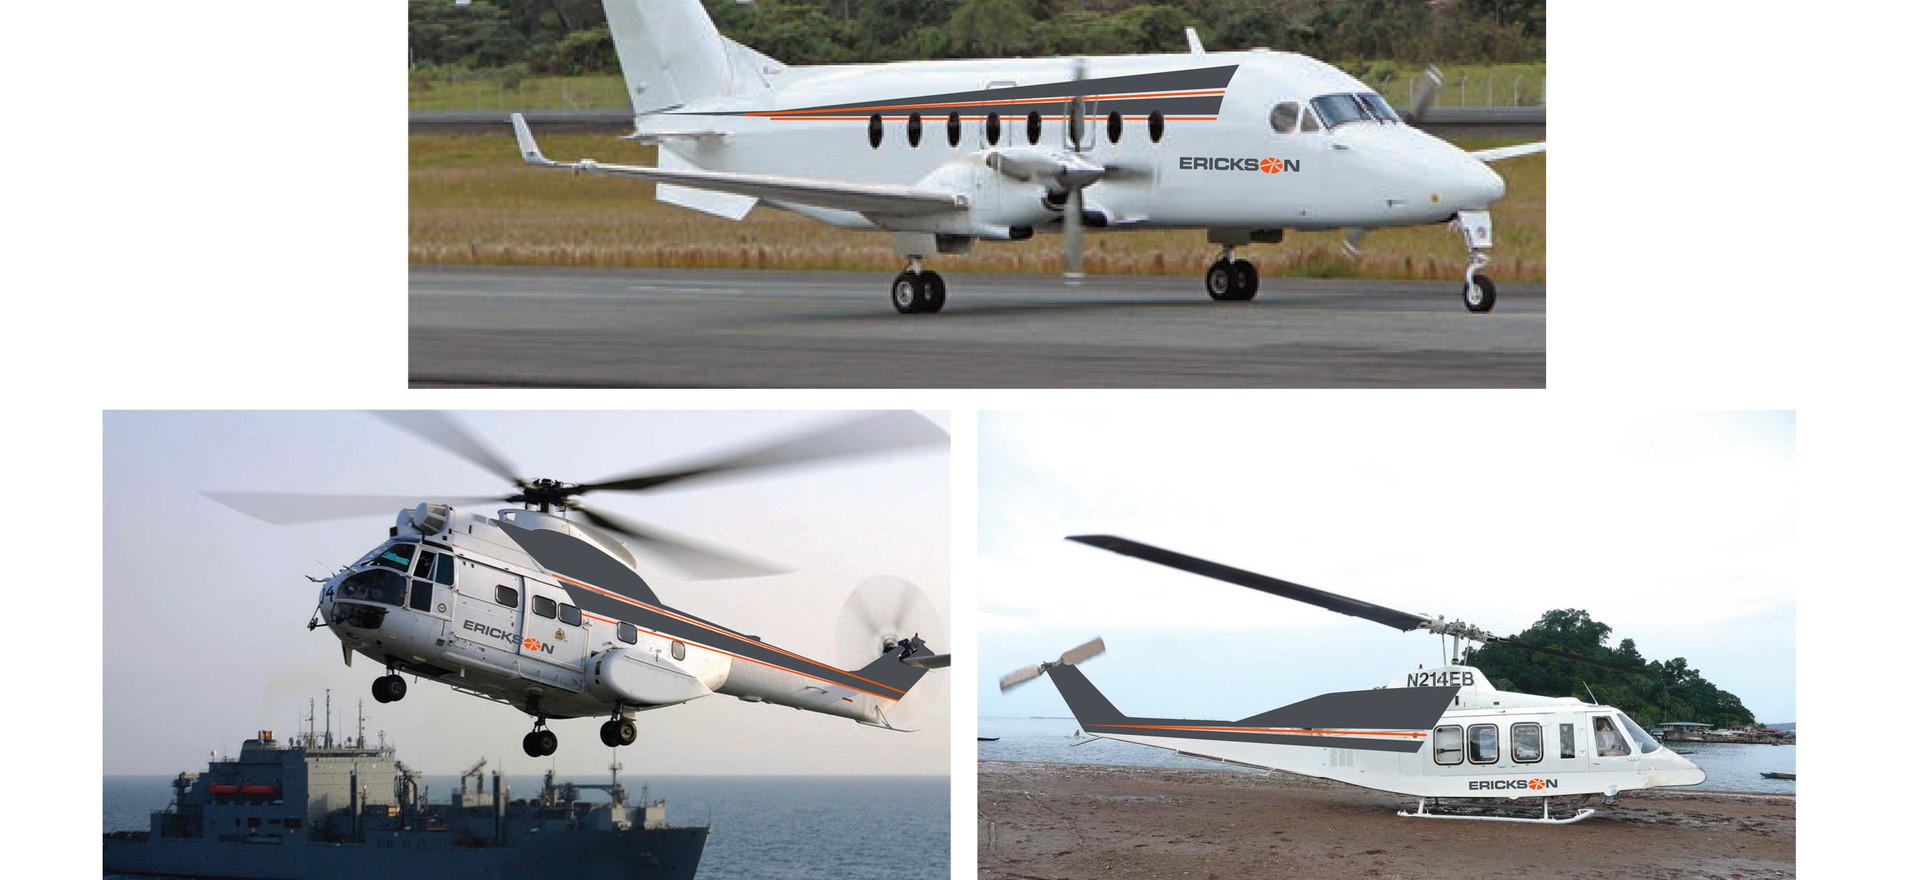 erickson aircraft.jpg